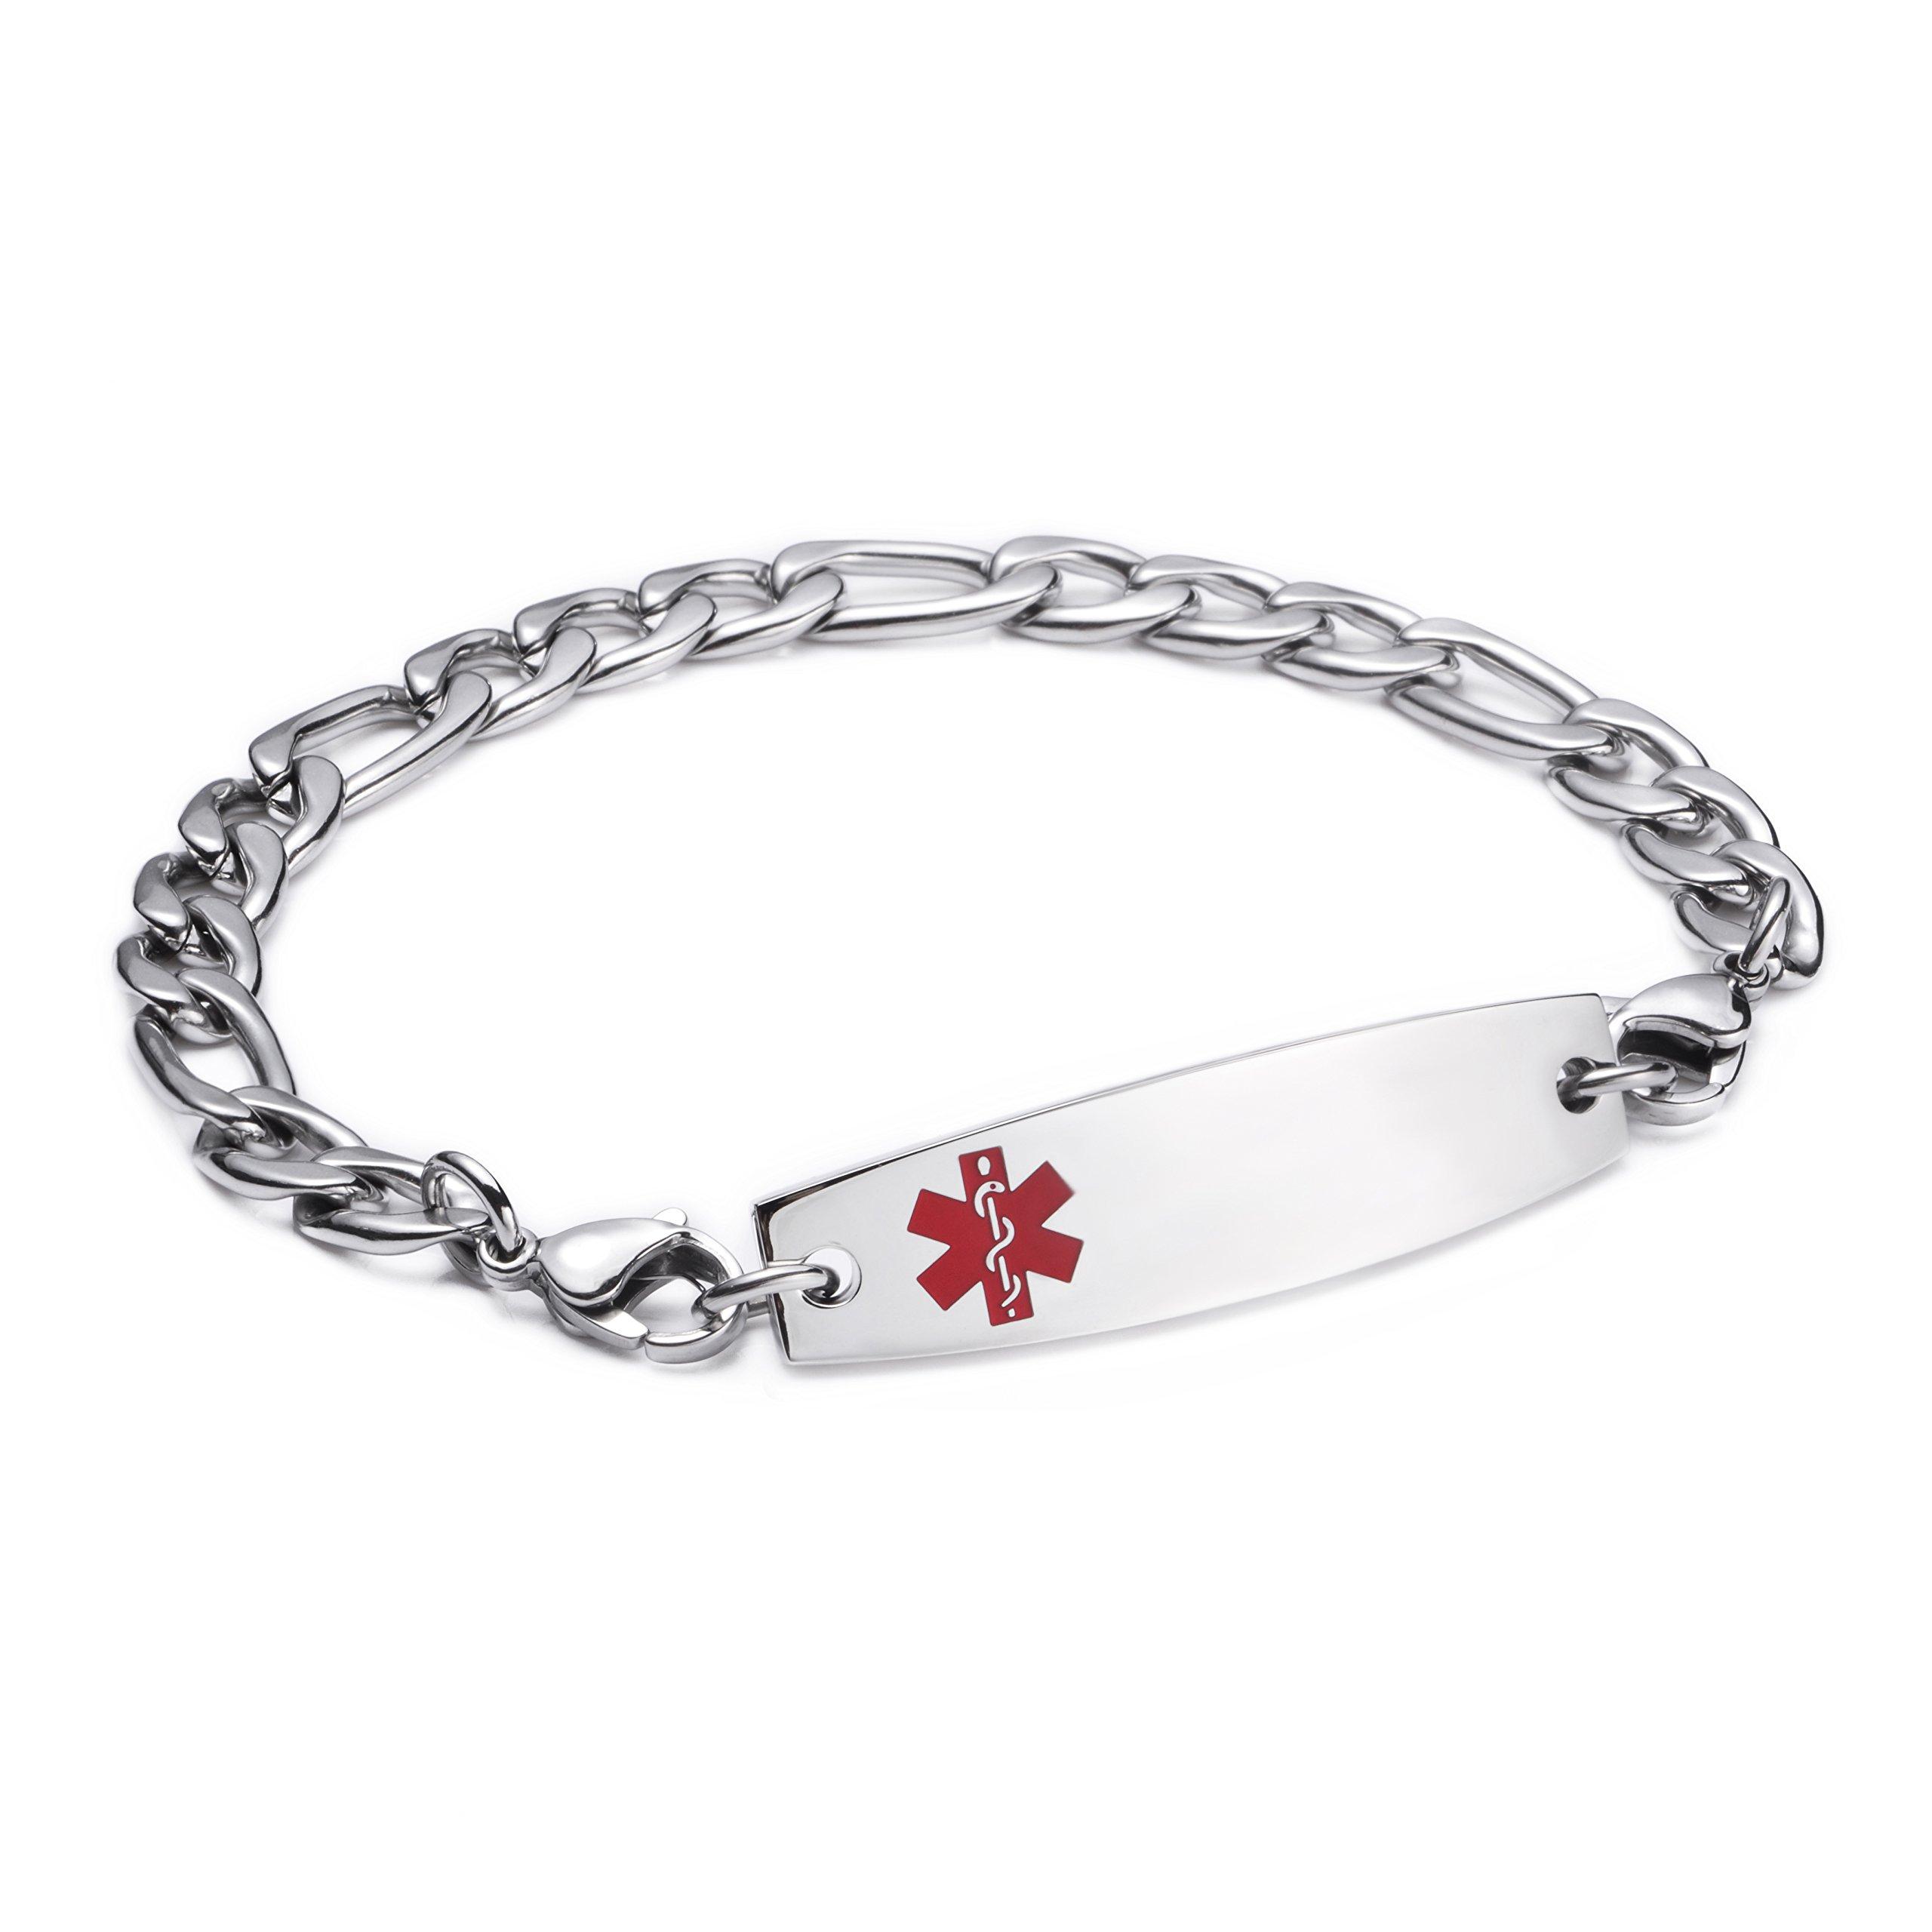 LinnaLove Stainless steel Figaro Chain Interchangeable medical alert bracelets-Free engraving(1351/8.5)